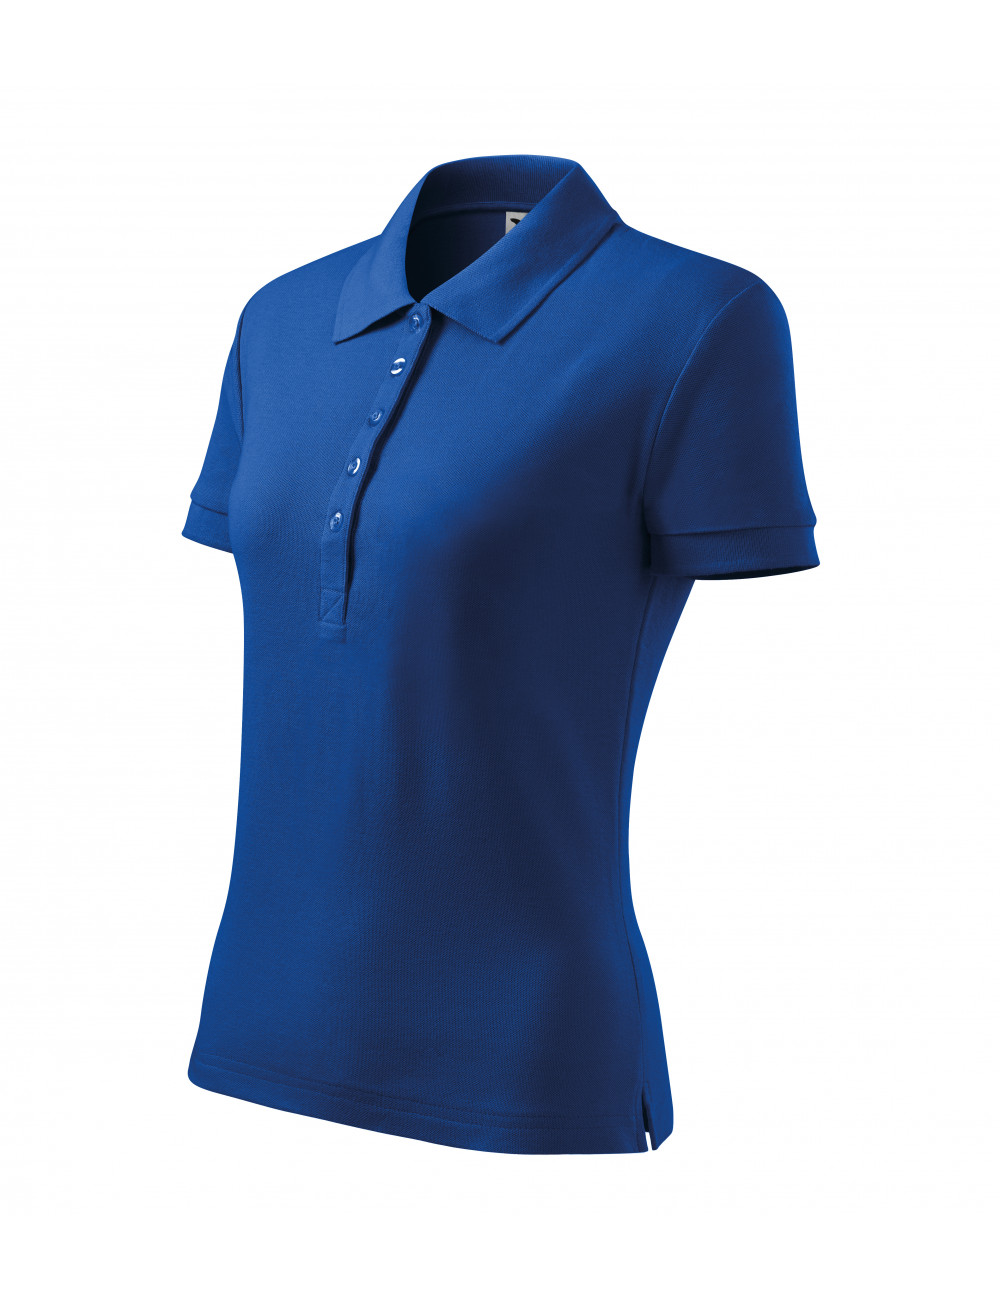 Adler MALFINI Koszulka polo damska Cotton Heavy 216 chabrowy